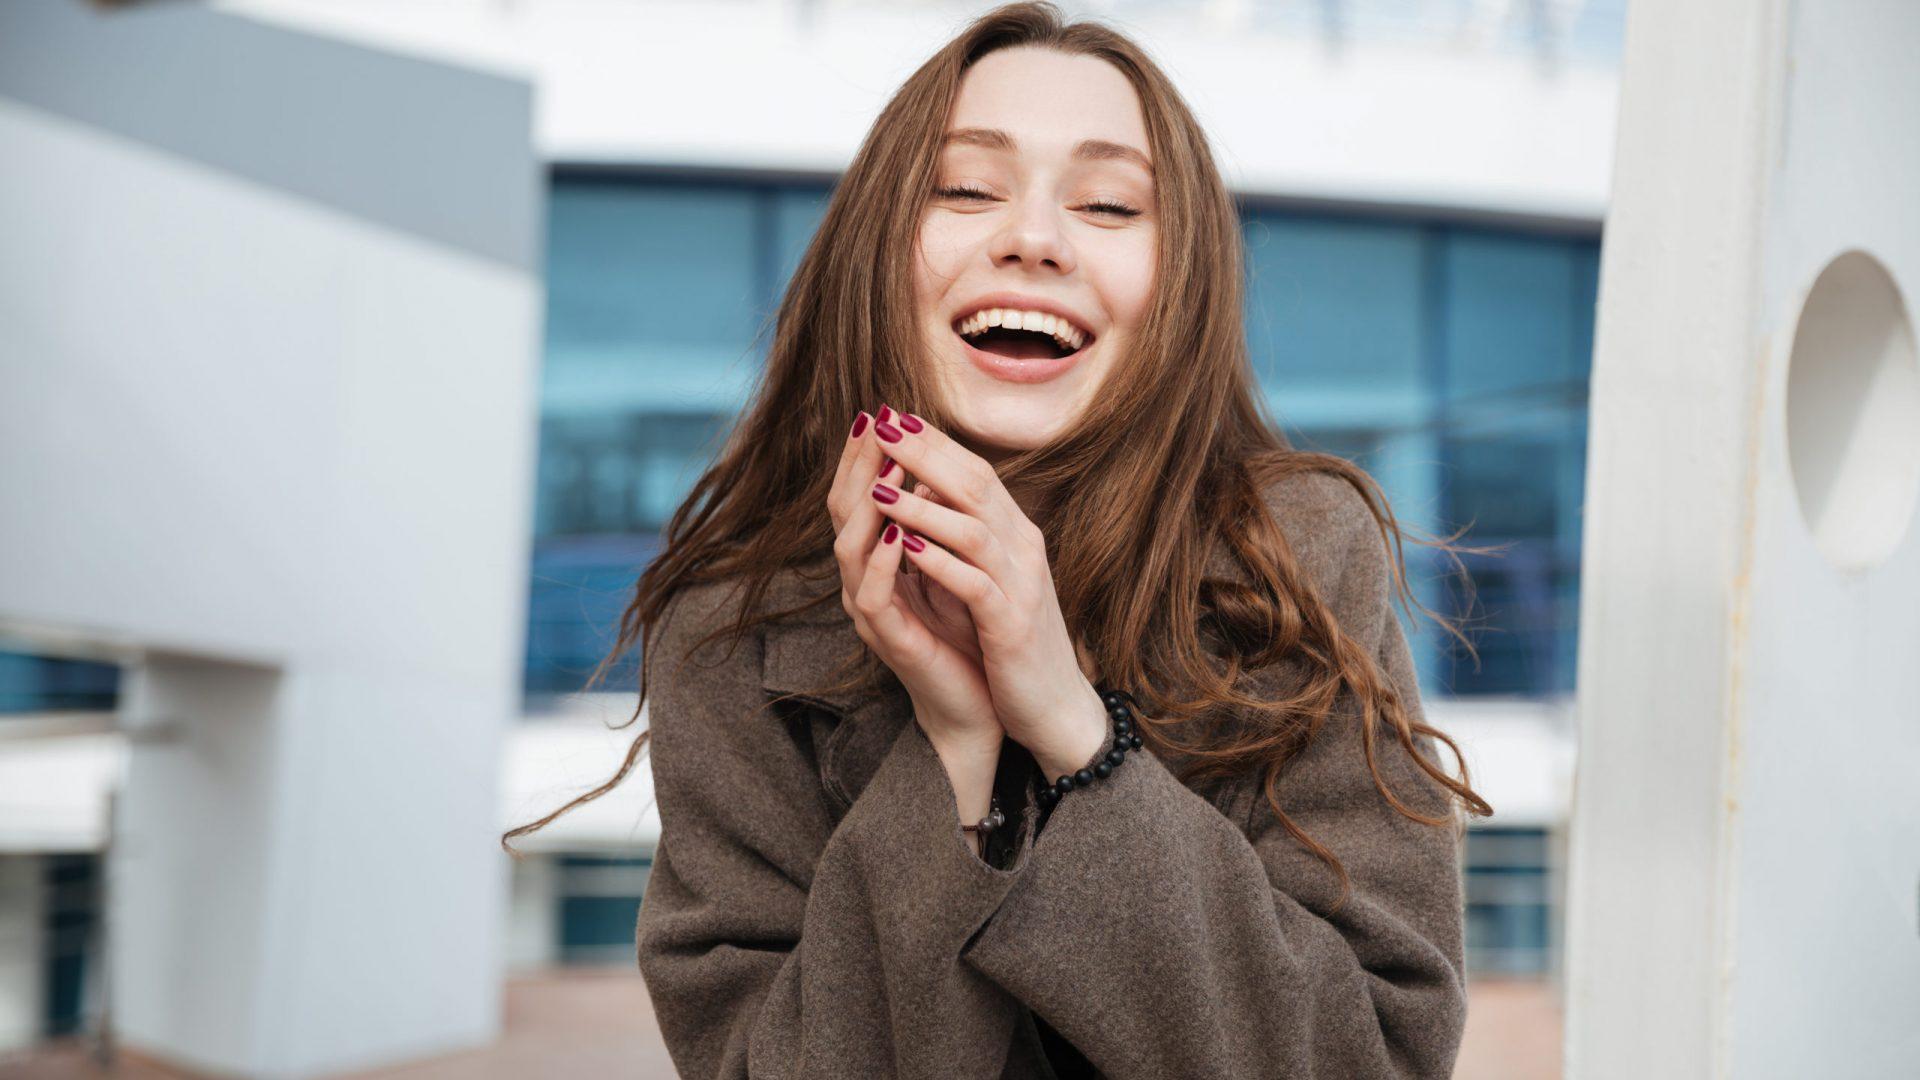 Brunette woman in coat laughing and enjoying walking